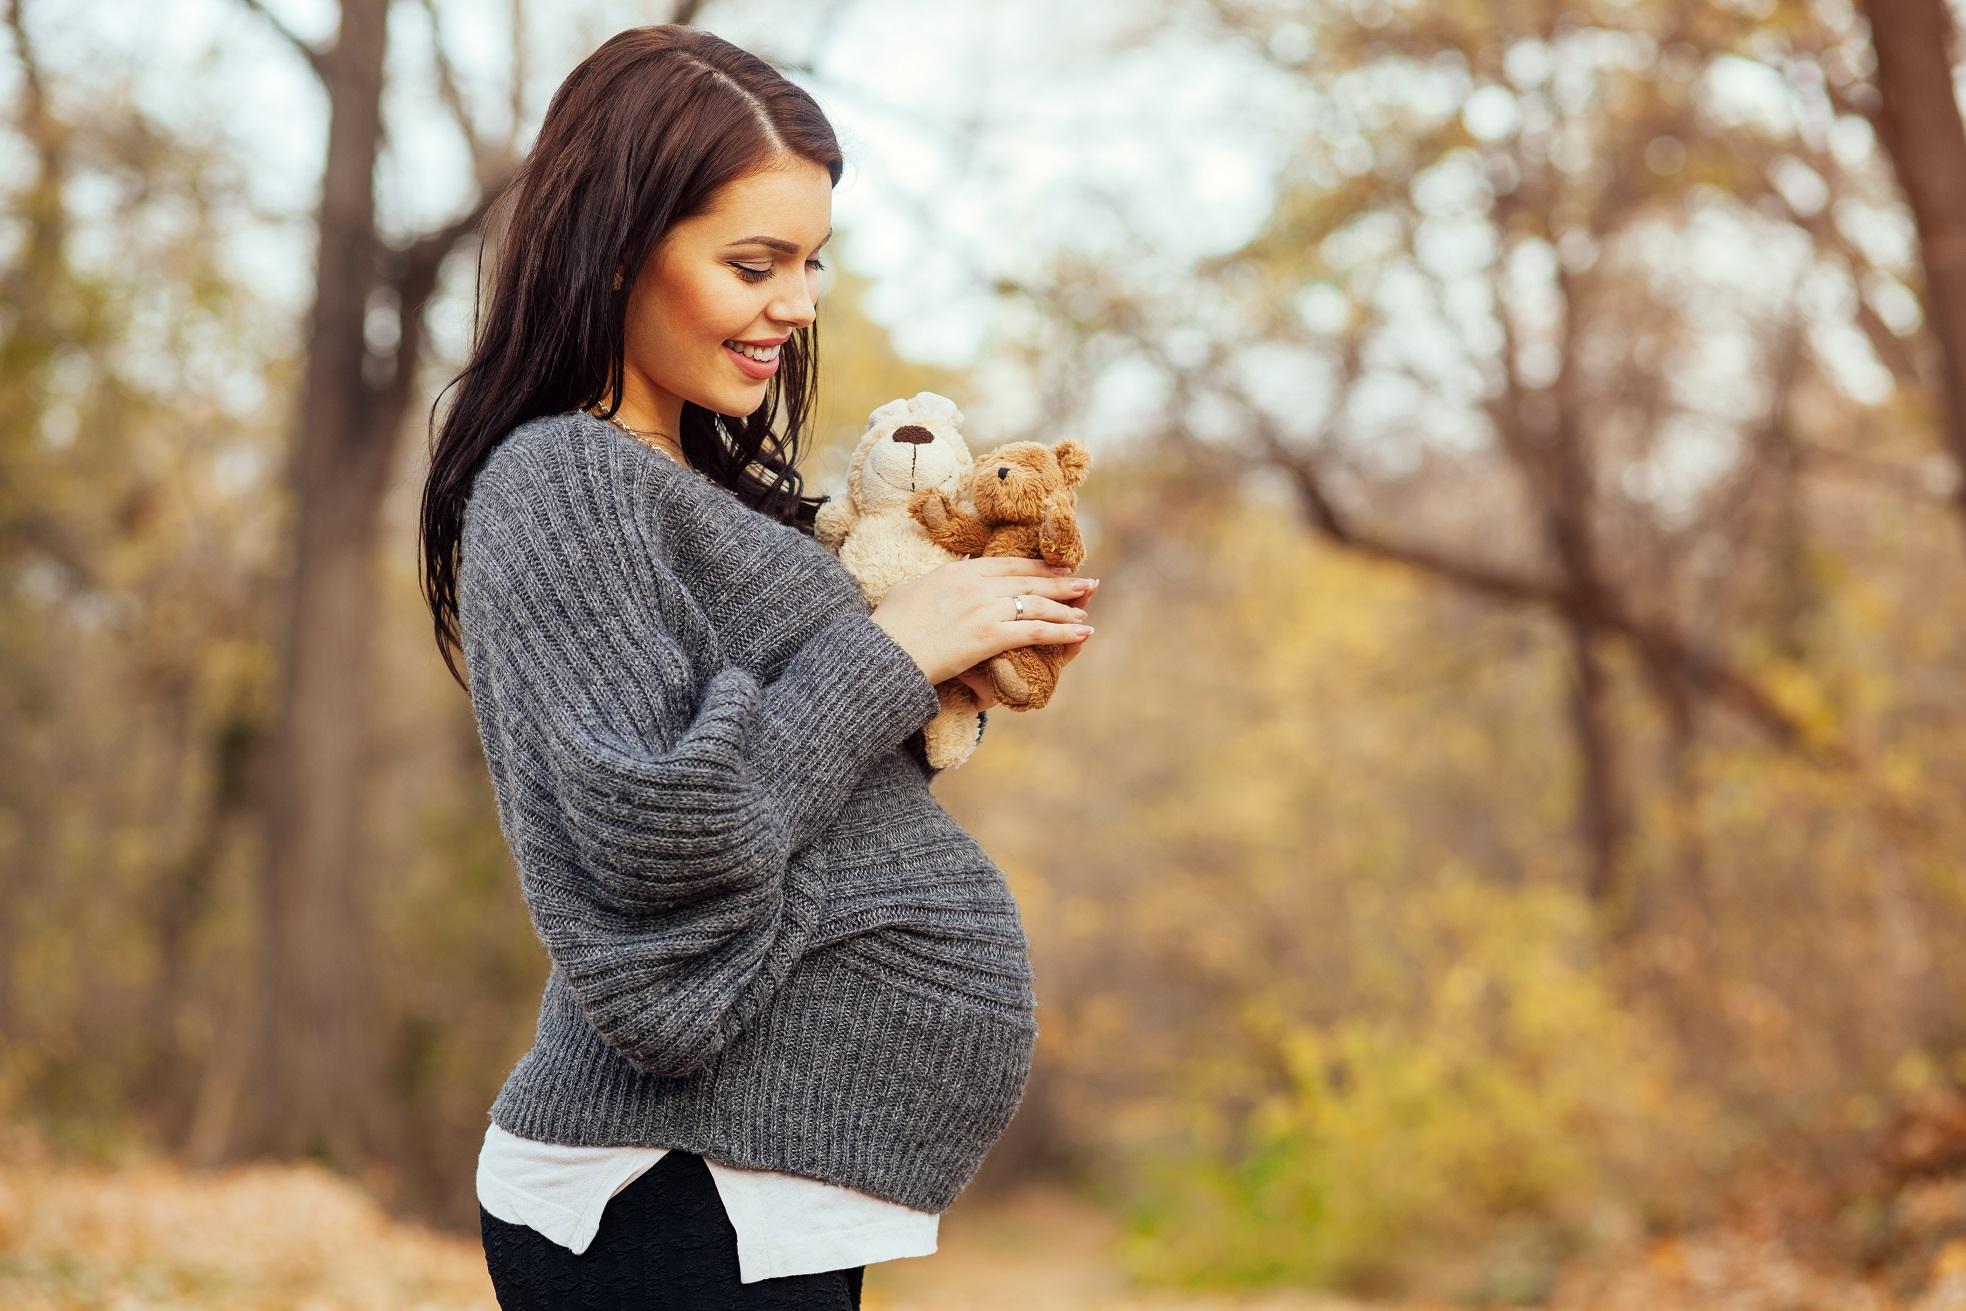 Lustvolle Geburt – Teil 2